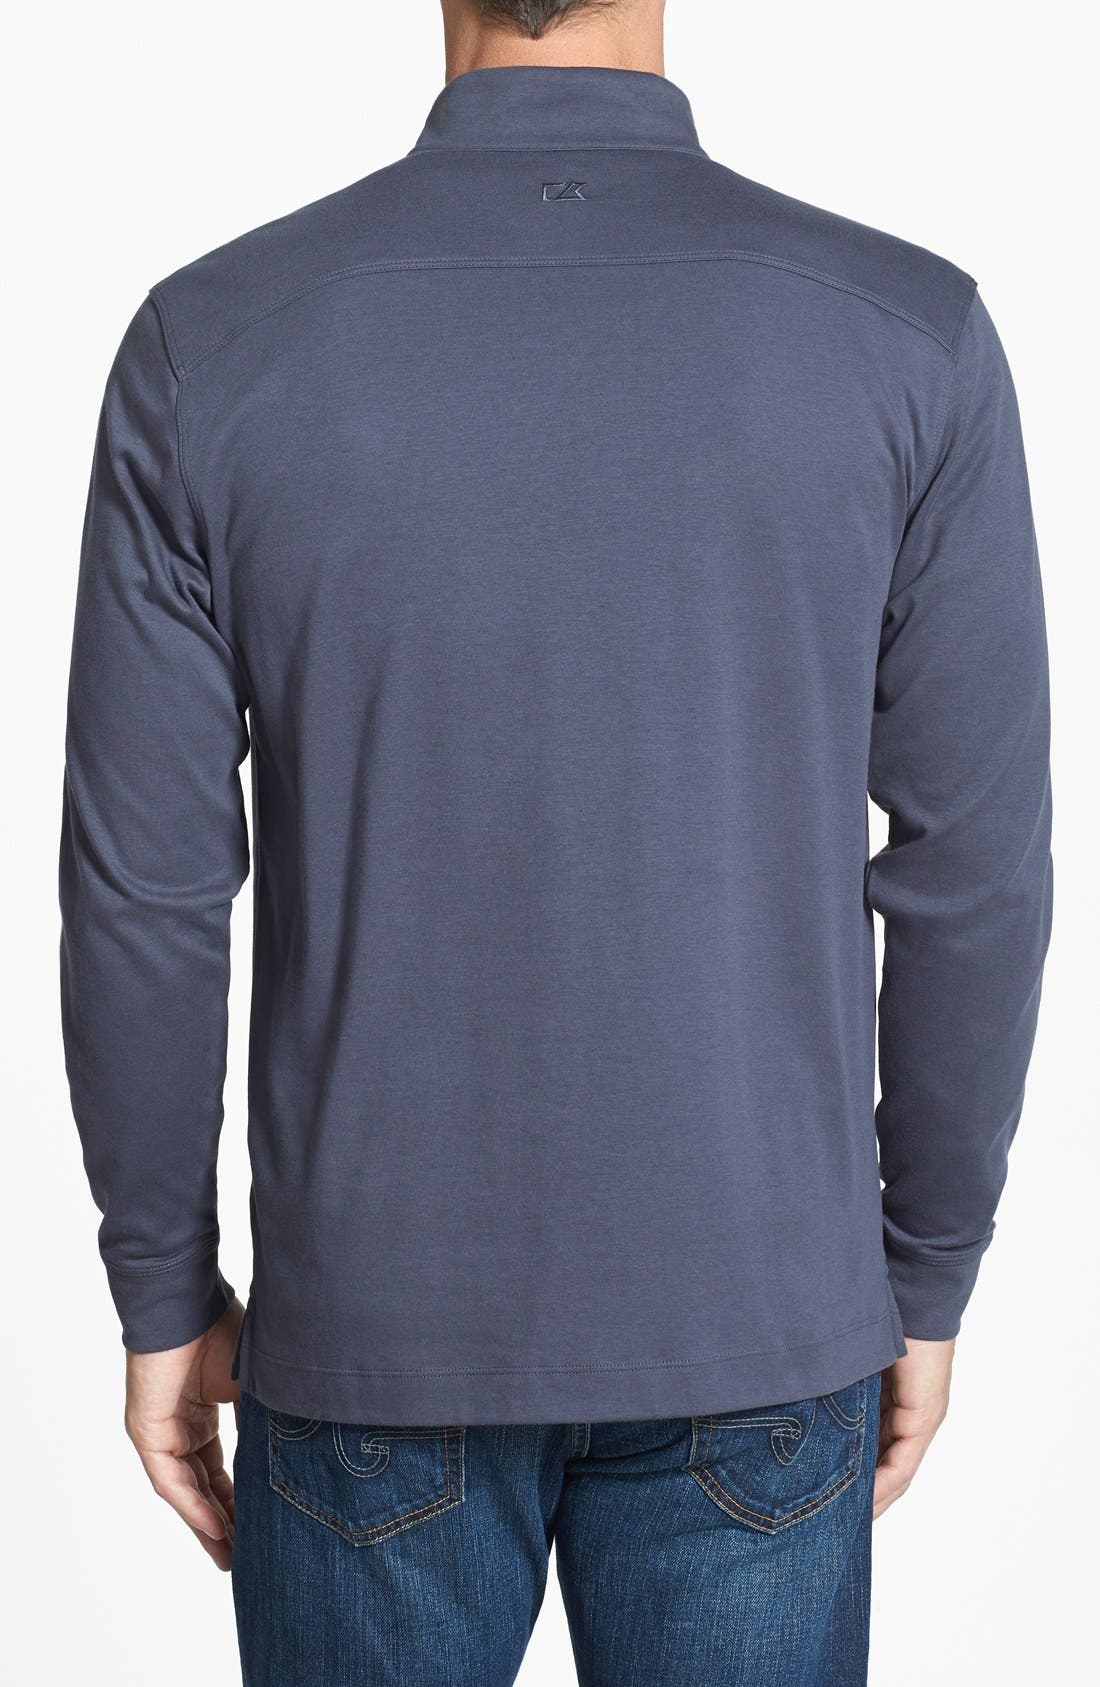 Belfair Quarter Zip Pullover,                             Alternate thumbnail 2, color,                             Onyx Grey